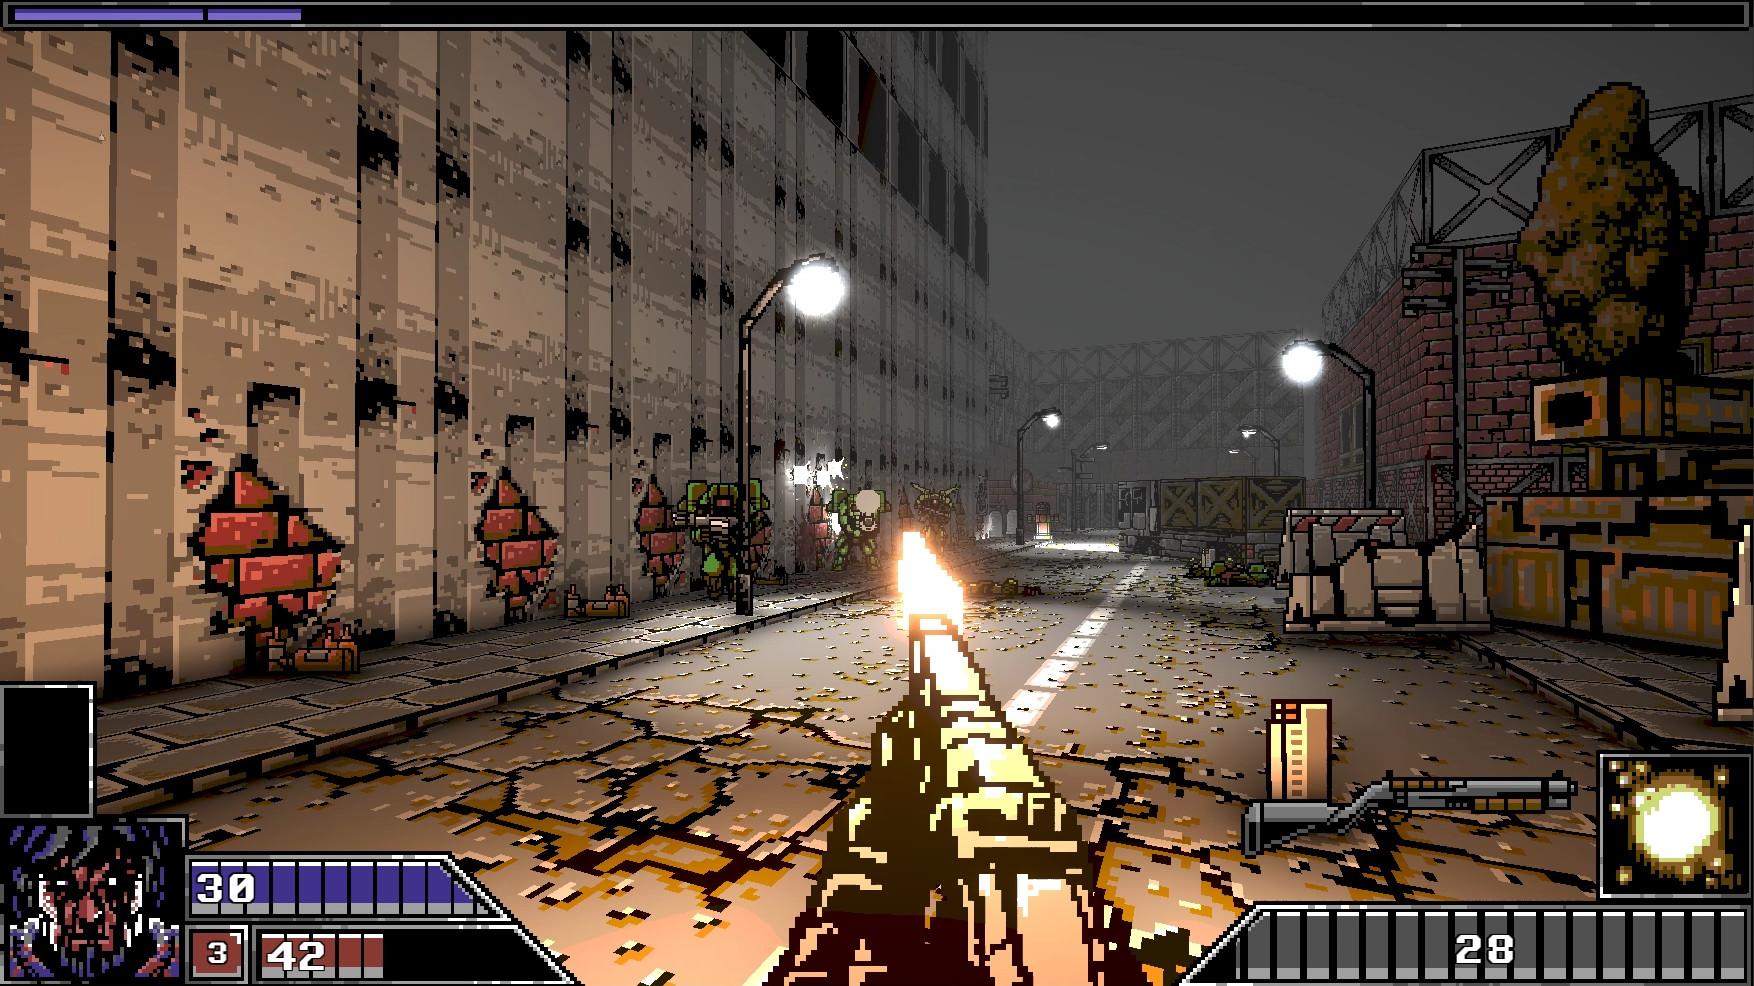 Project Warlock - Gameplay